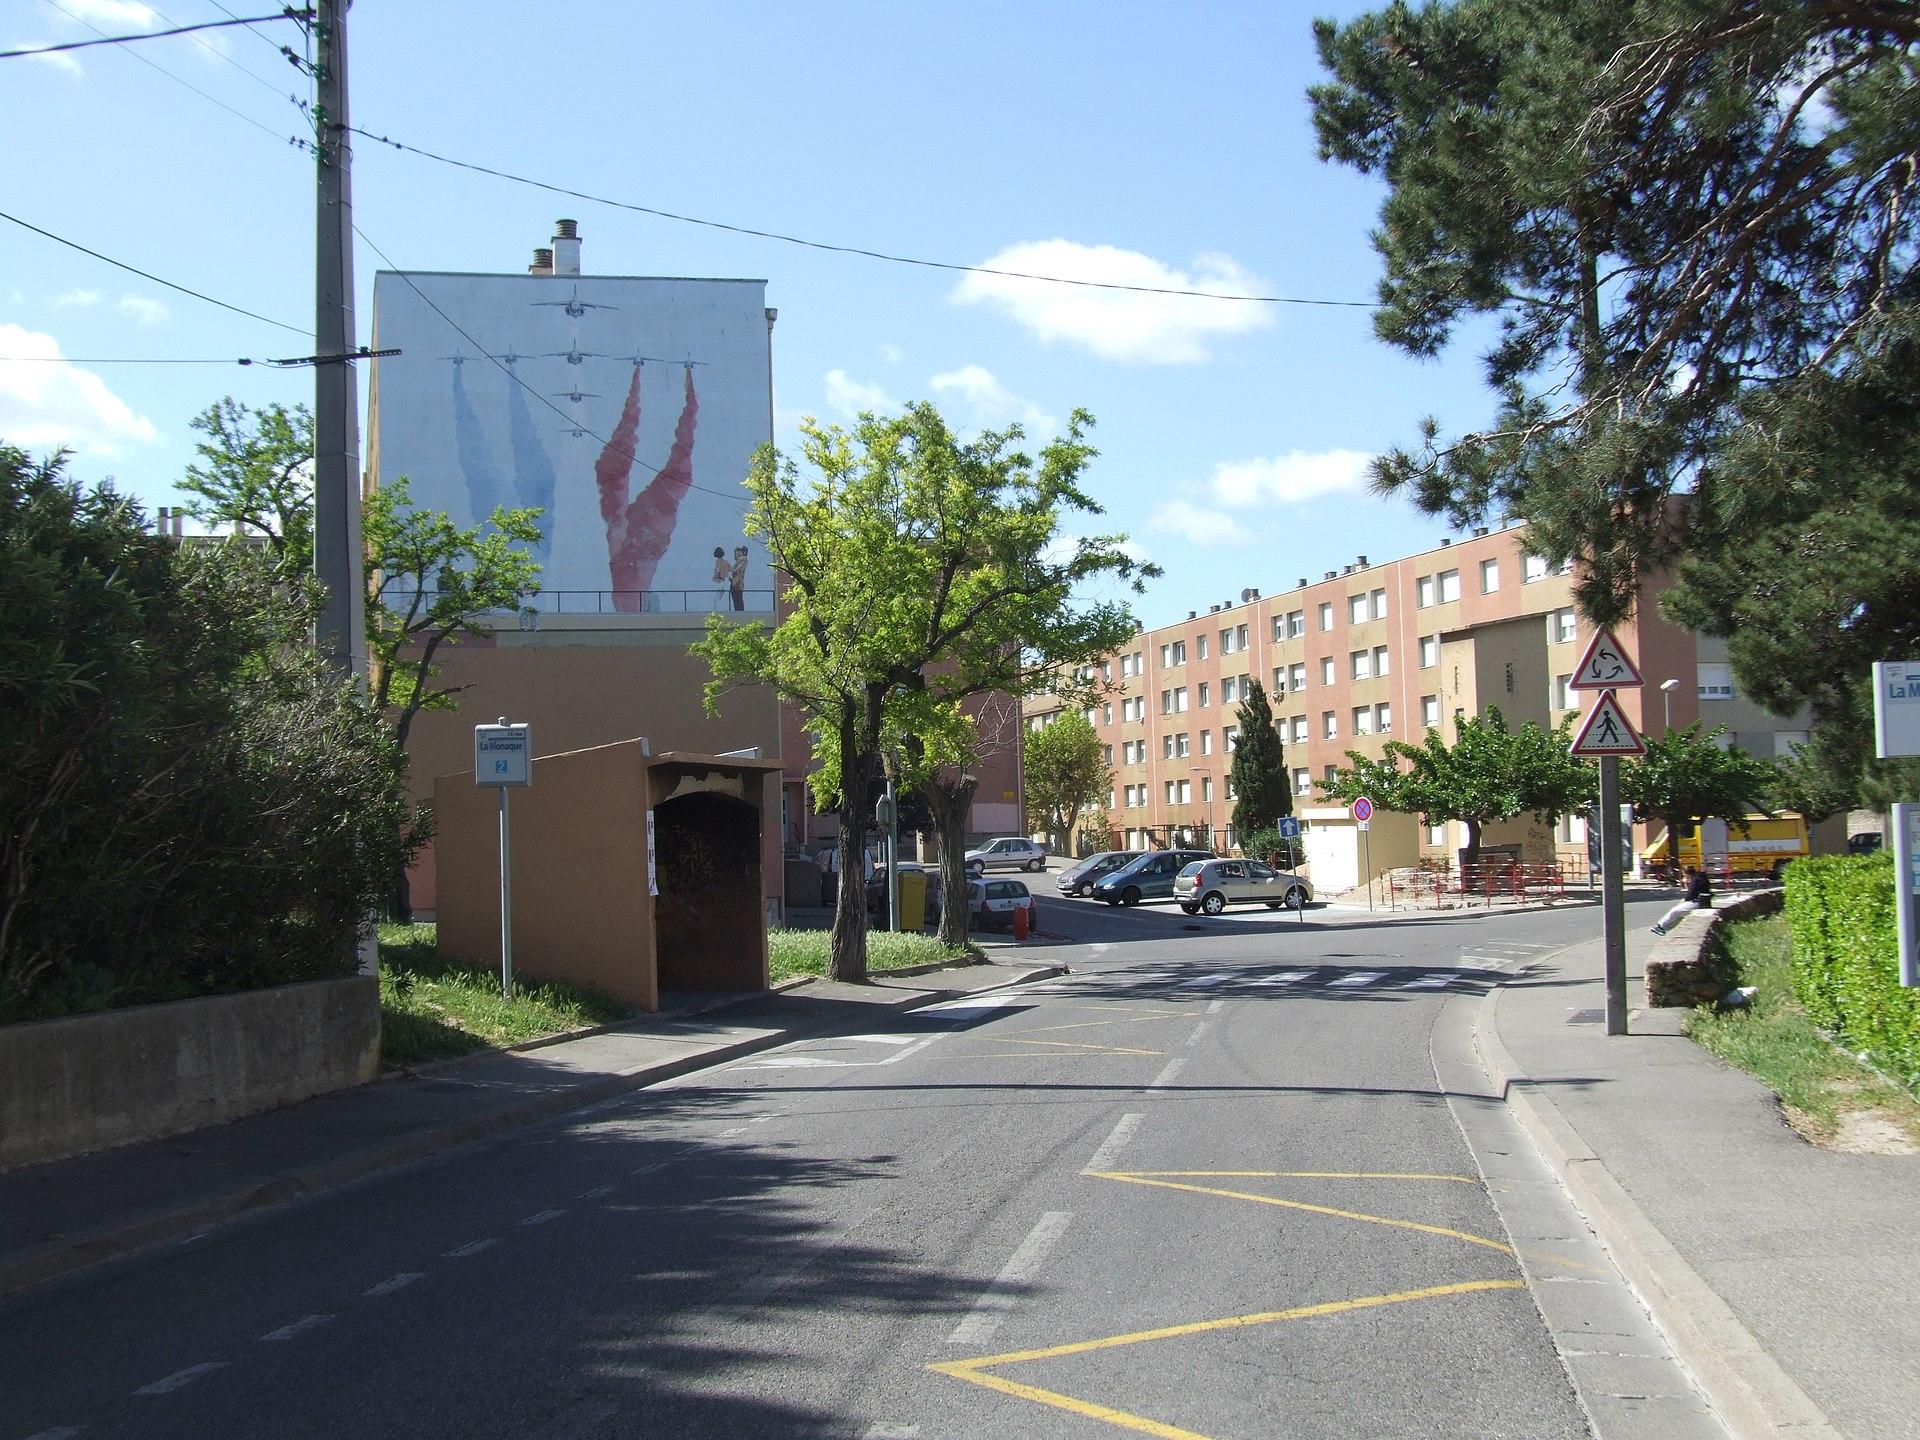 La monaque wikip dia - Location a salon de provence ...